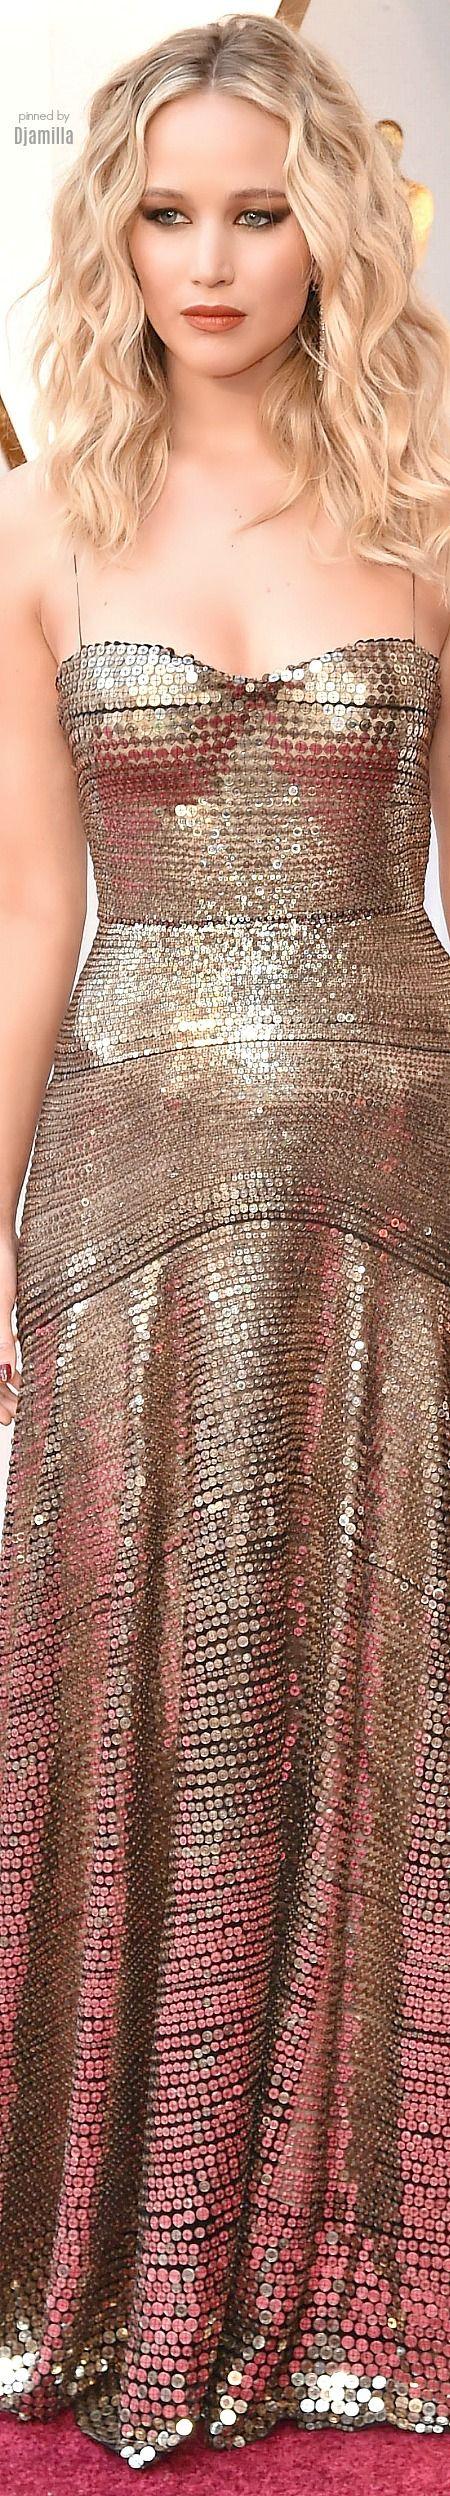 Jennifer Lawrence - The Oscars 2018 ~ in Dior Pre-Fall